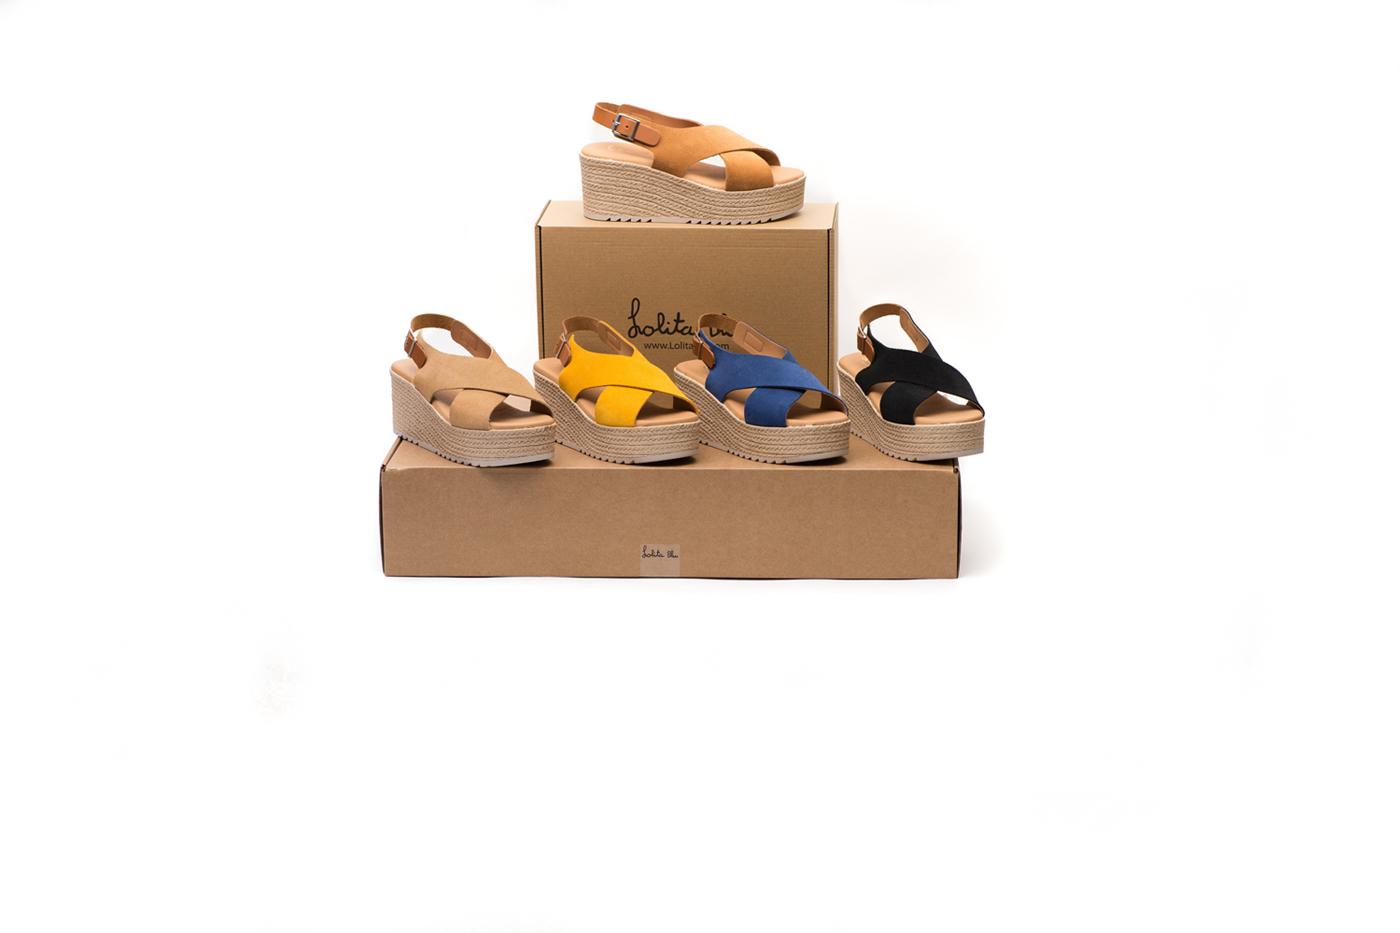 Zapatos Online Lolitablu Zapatos Lolita Lolita Zapatos Lolita Blu Blu Lolitablu Blu Online TcKFl1J